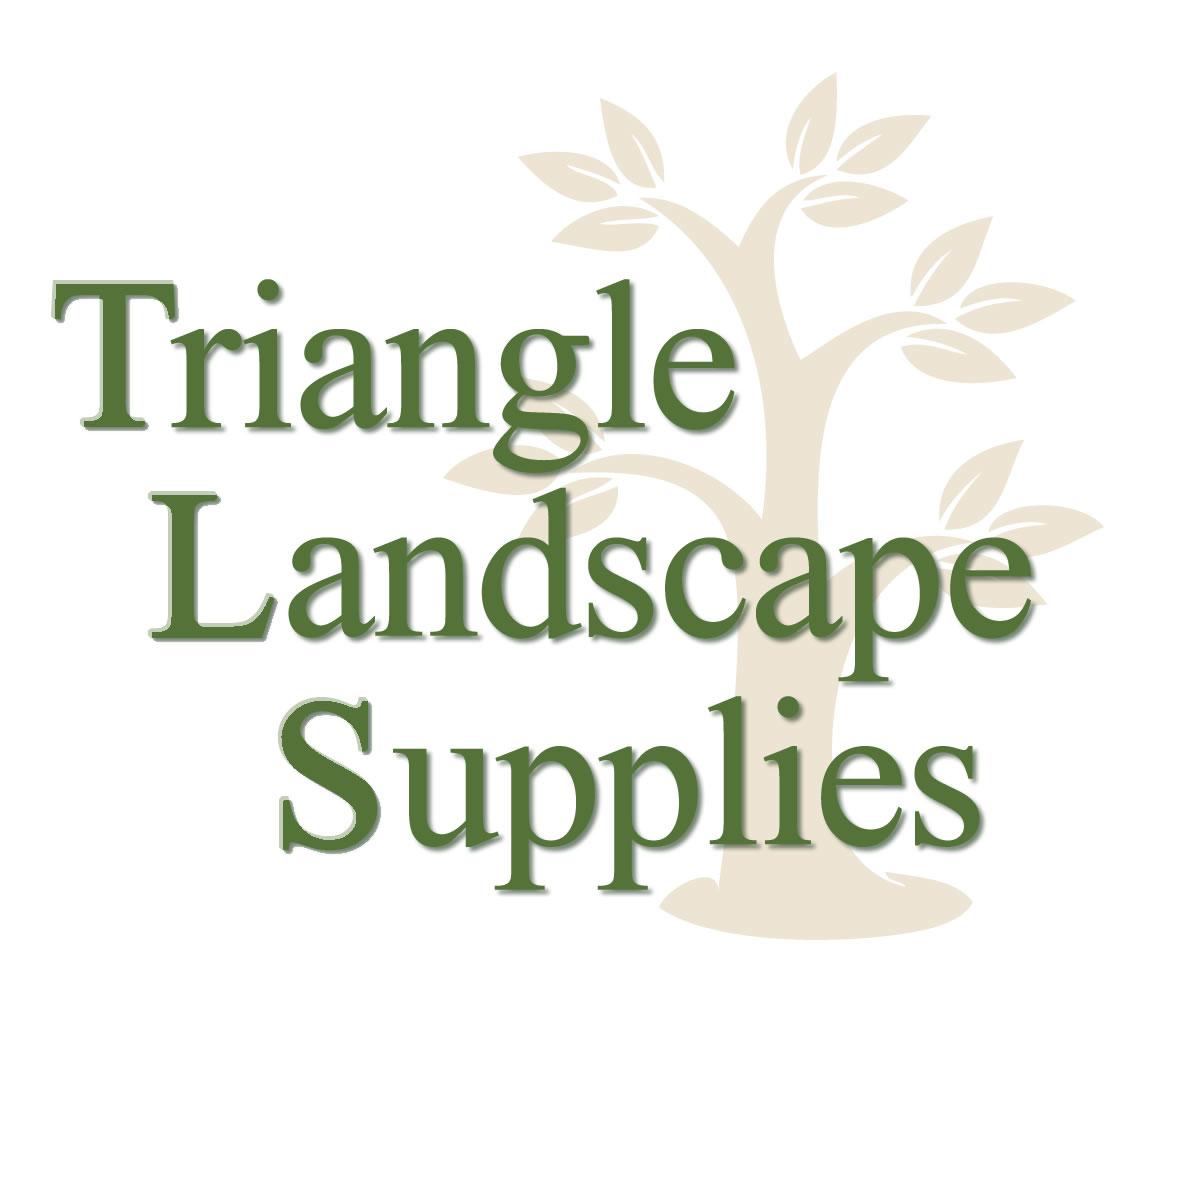 Triangle Landscape Supplies, Garner - Garner, NC - Landscape Architects & Design